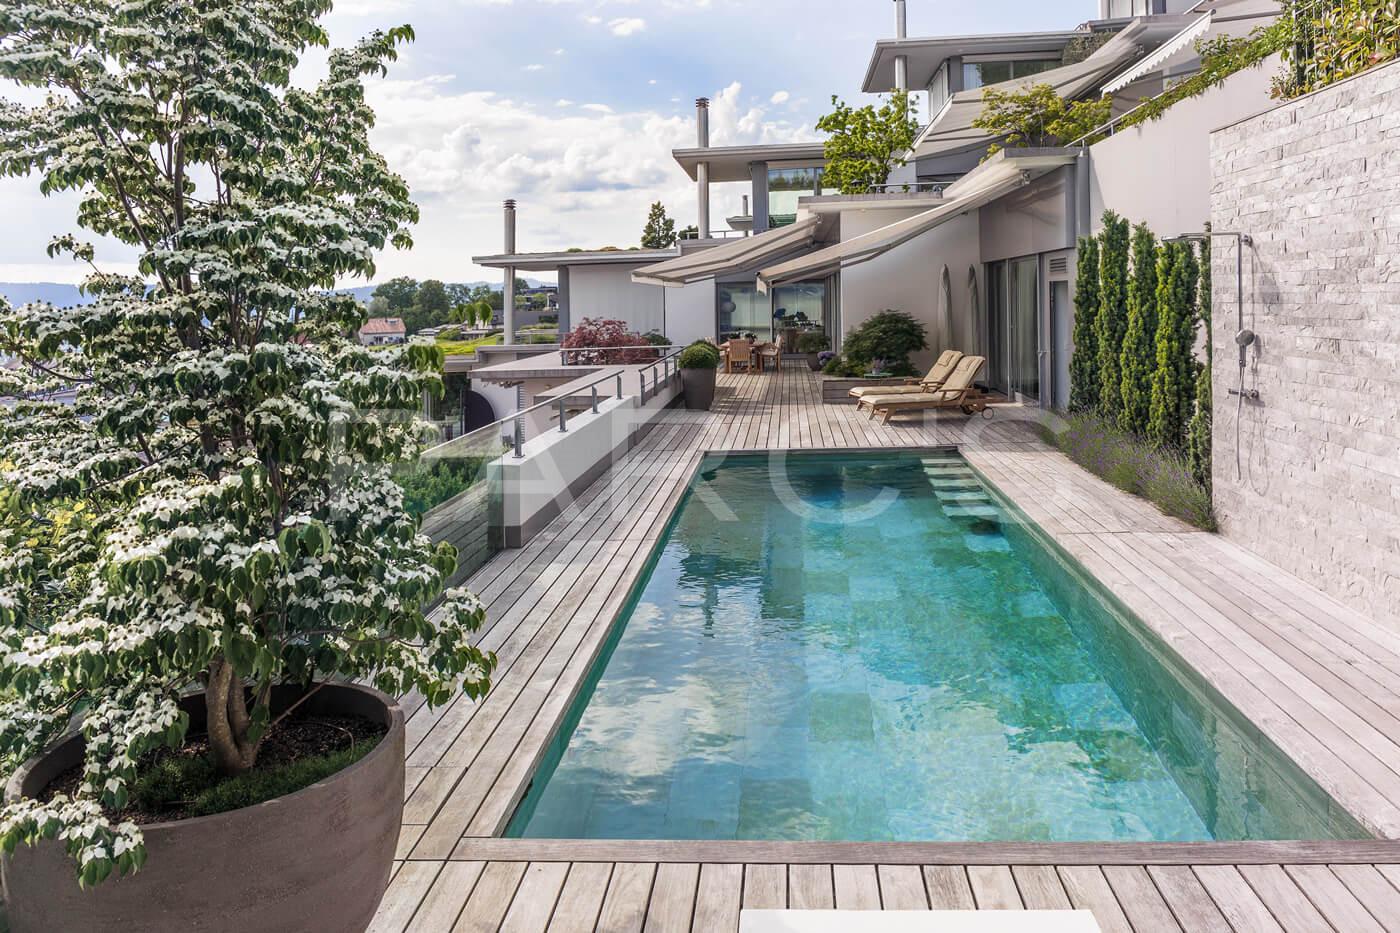 terrasse mit pool parc 39 s gartengestaltung gmbh. Black Bedroom Furniture Sets. Home Design Ideas